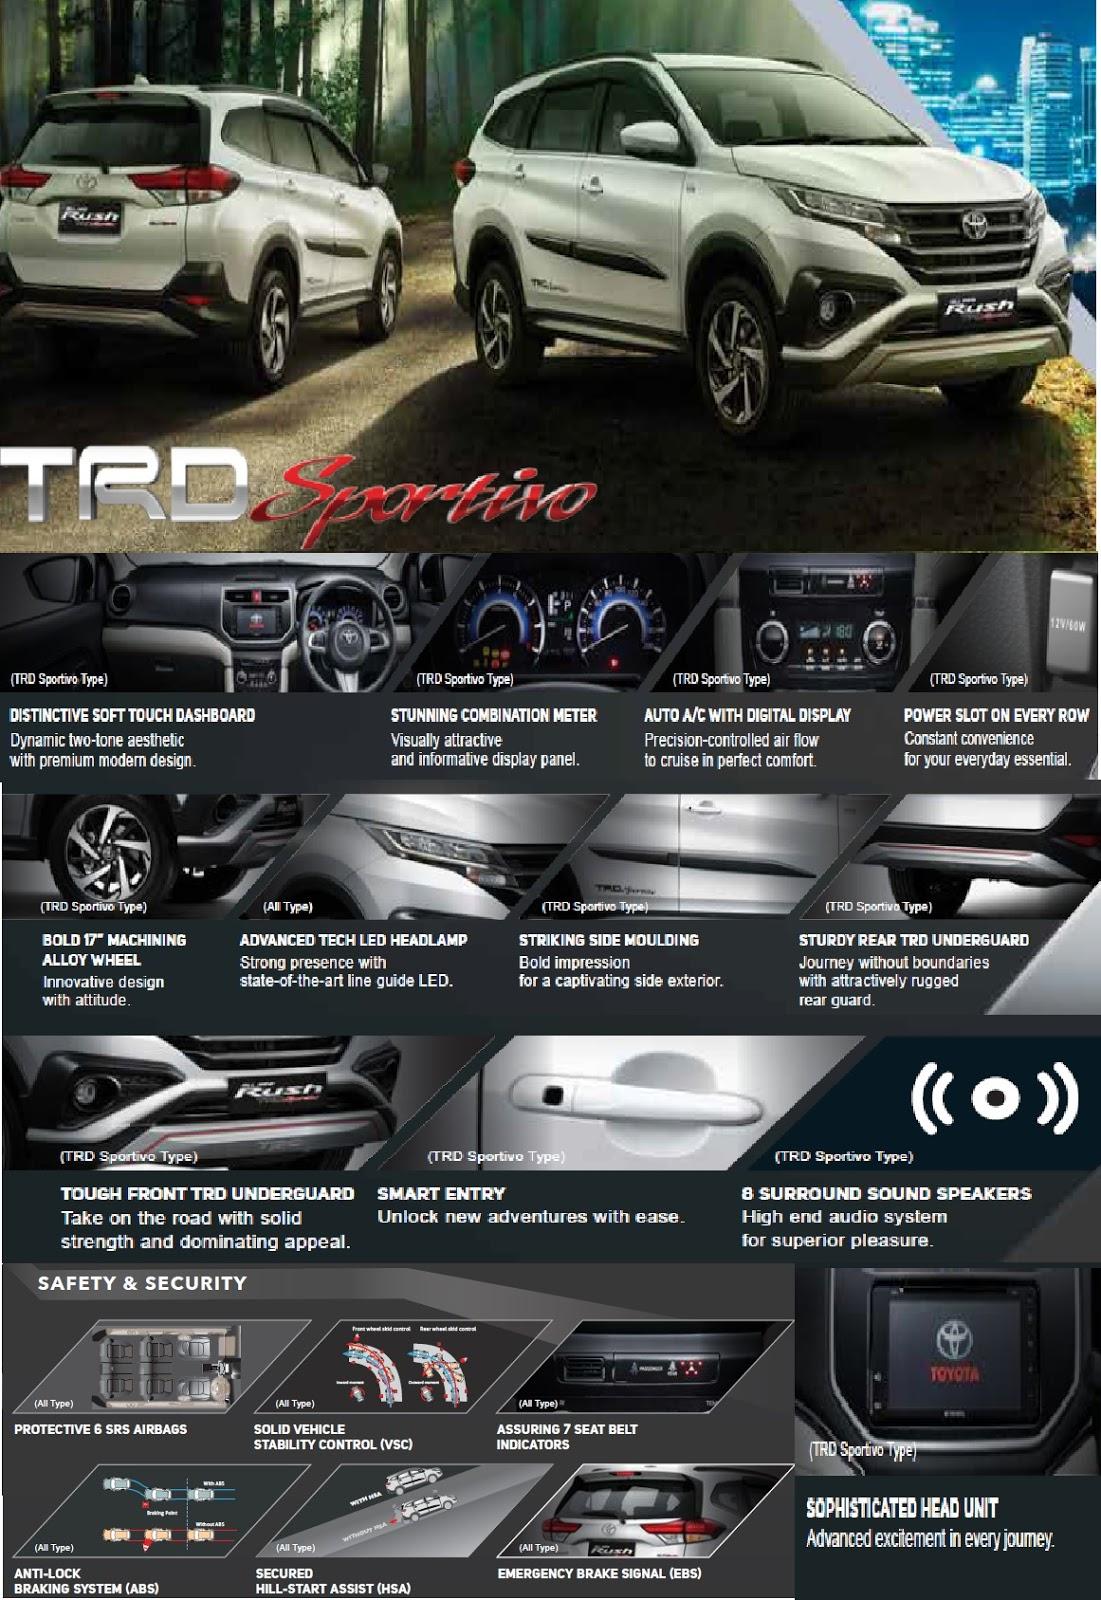 Harga All New Yaris Trd Sportivo 2018 Agya 1.2 G A/t Rush - Auto2000 Lenteng Agung